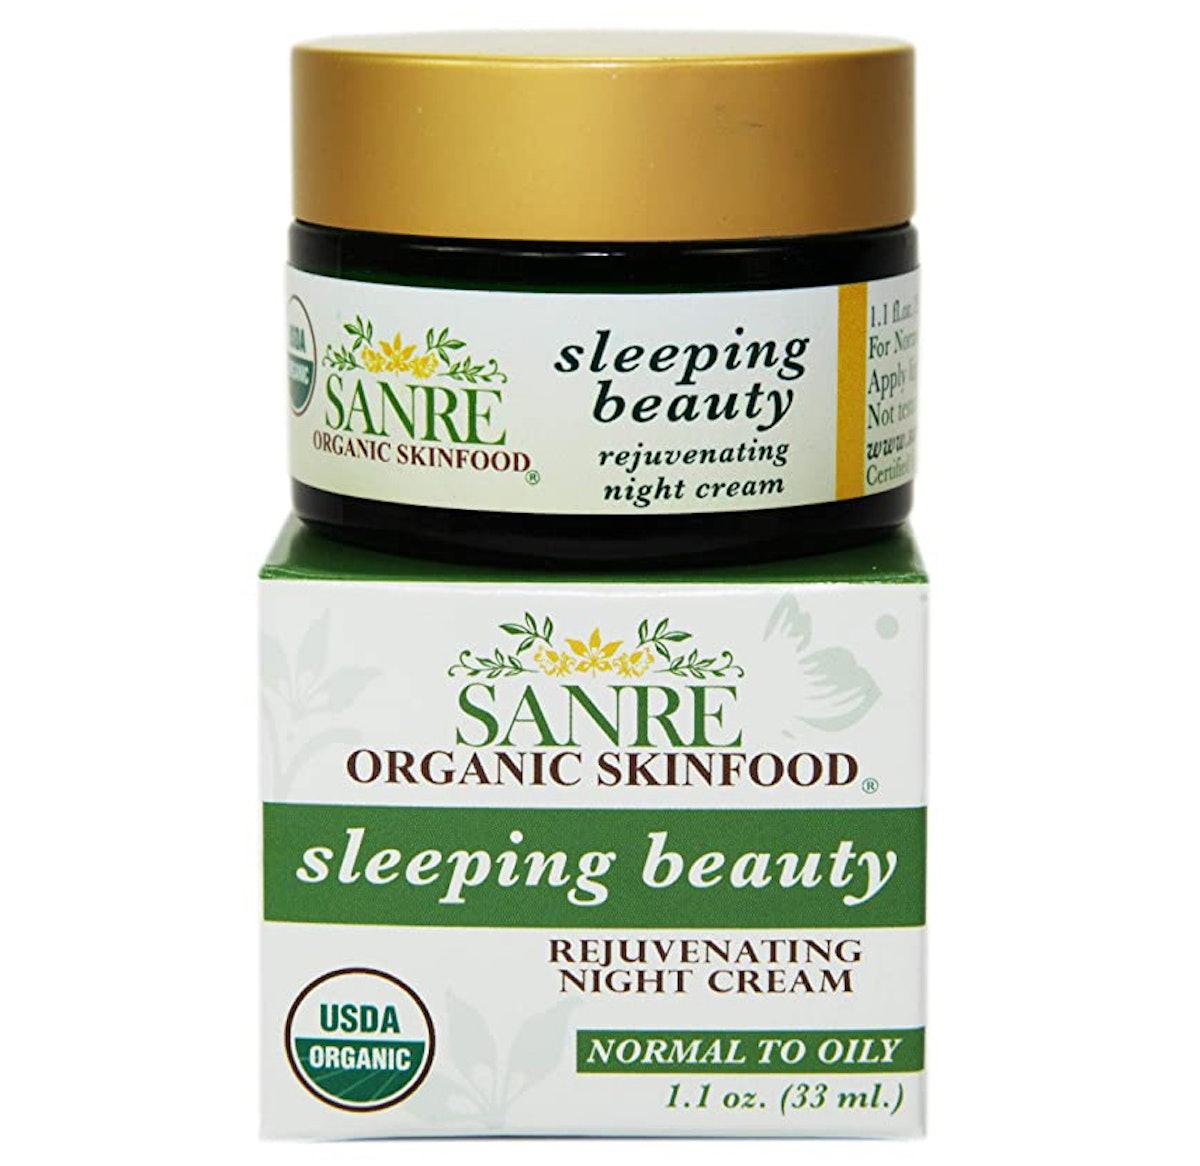 SanRe Organic Skinfood Sleeping Beauty Rejuvenating Night Cream